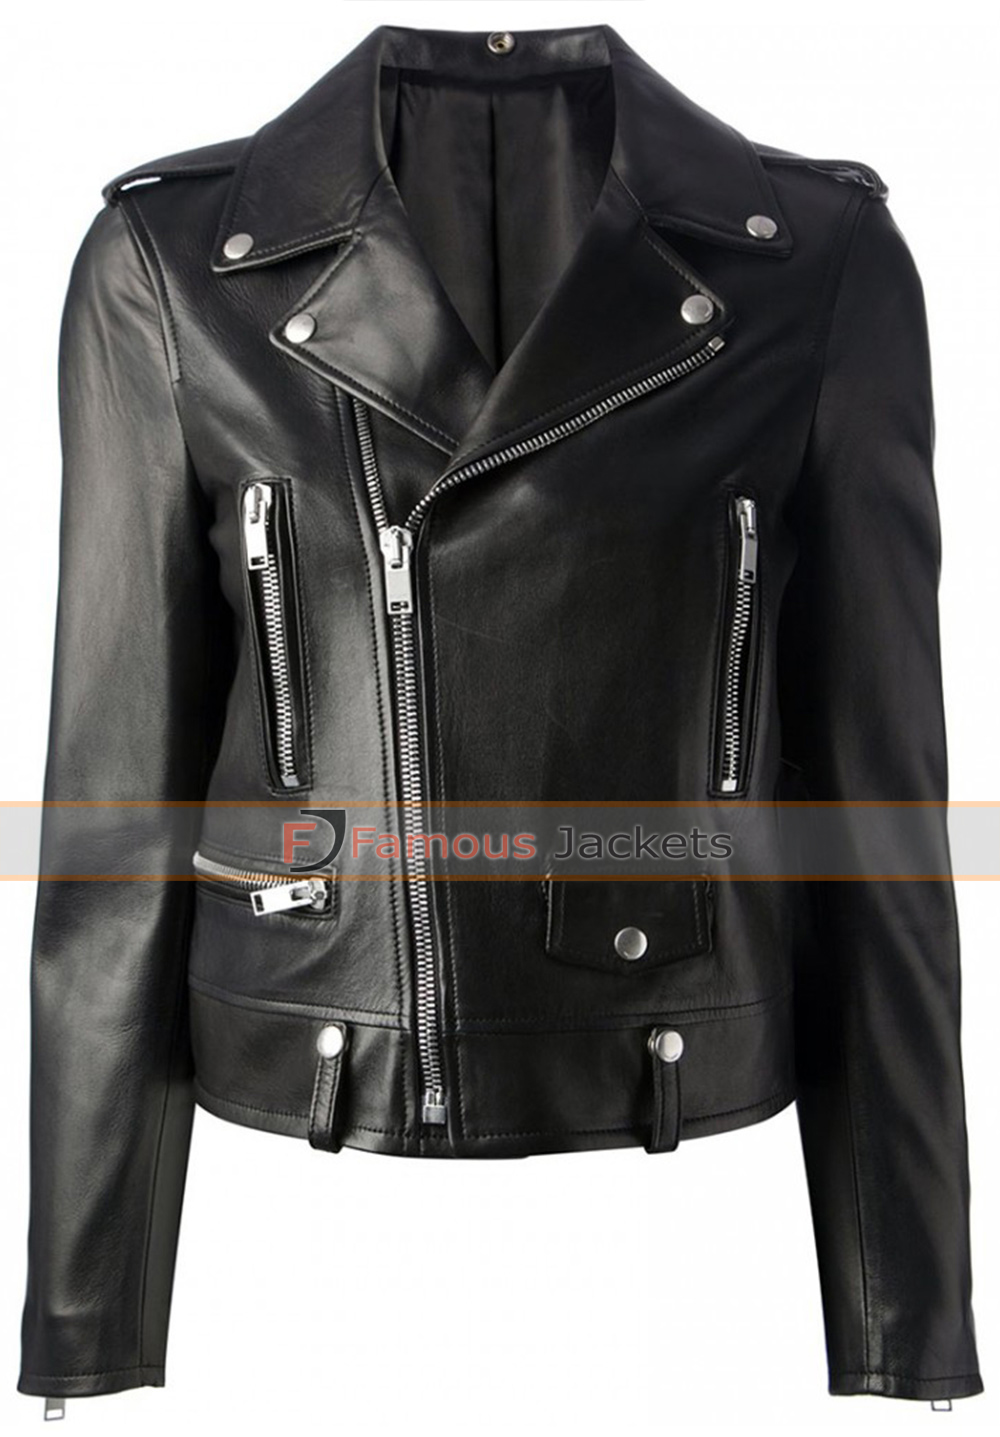 mariah carey black motorcycle style leather jacket £ 127 ...